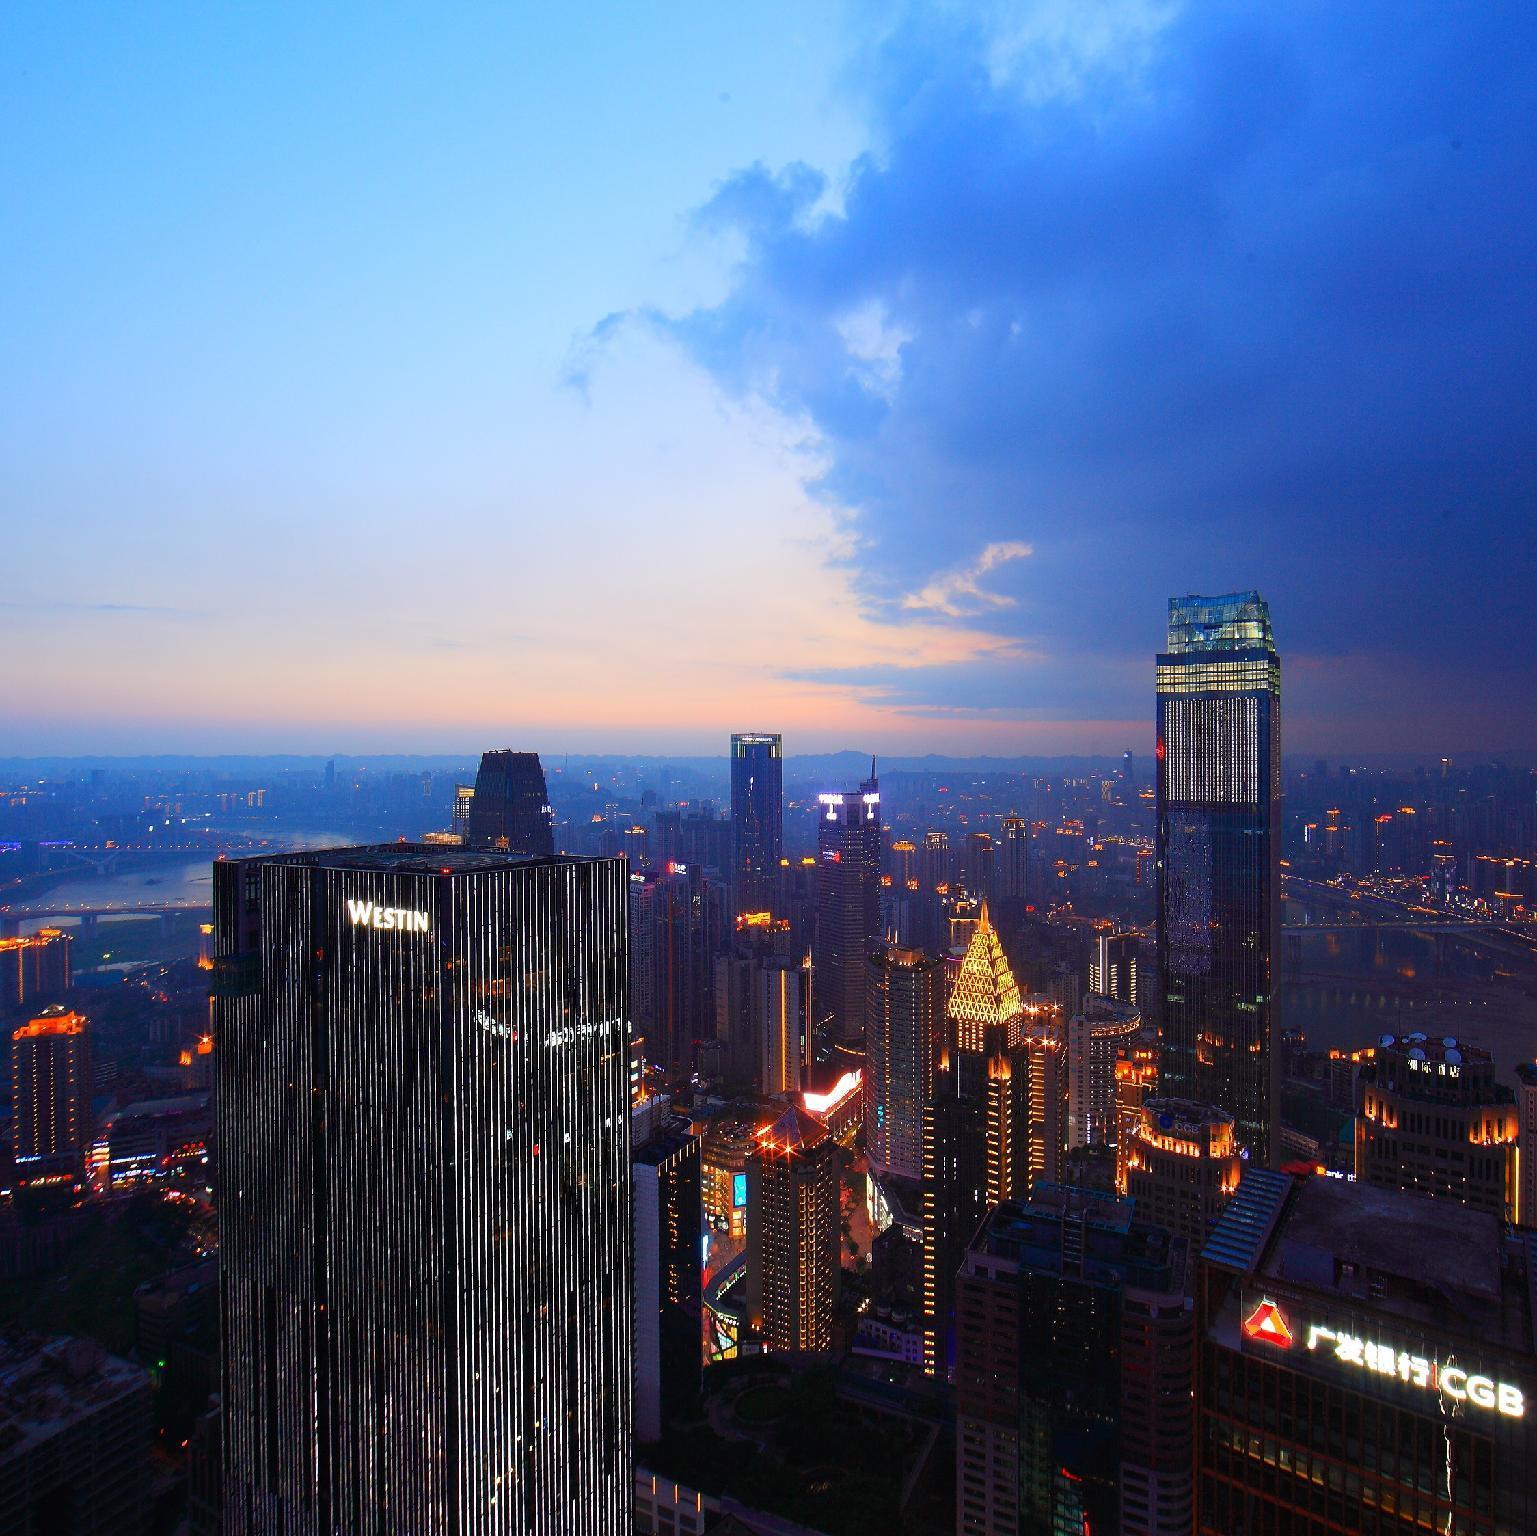 The Westin Chongqing Liberation Square